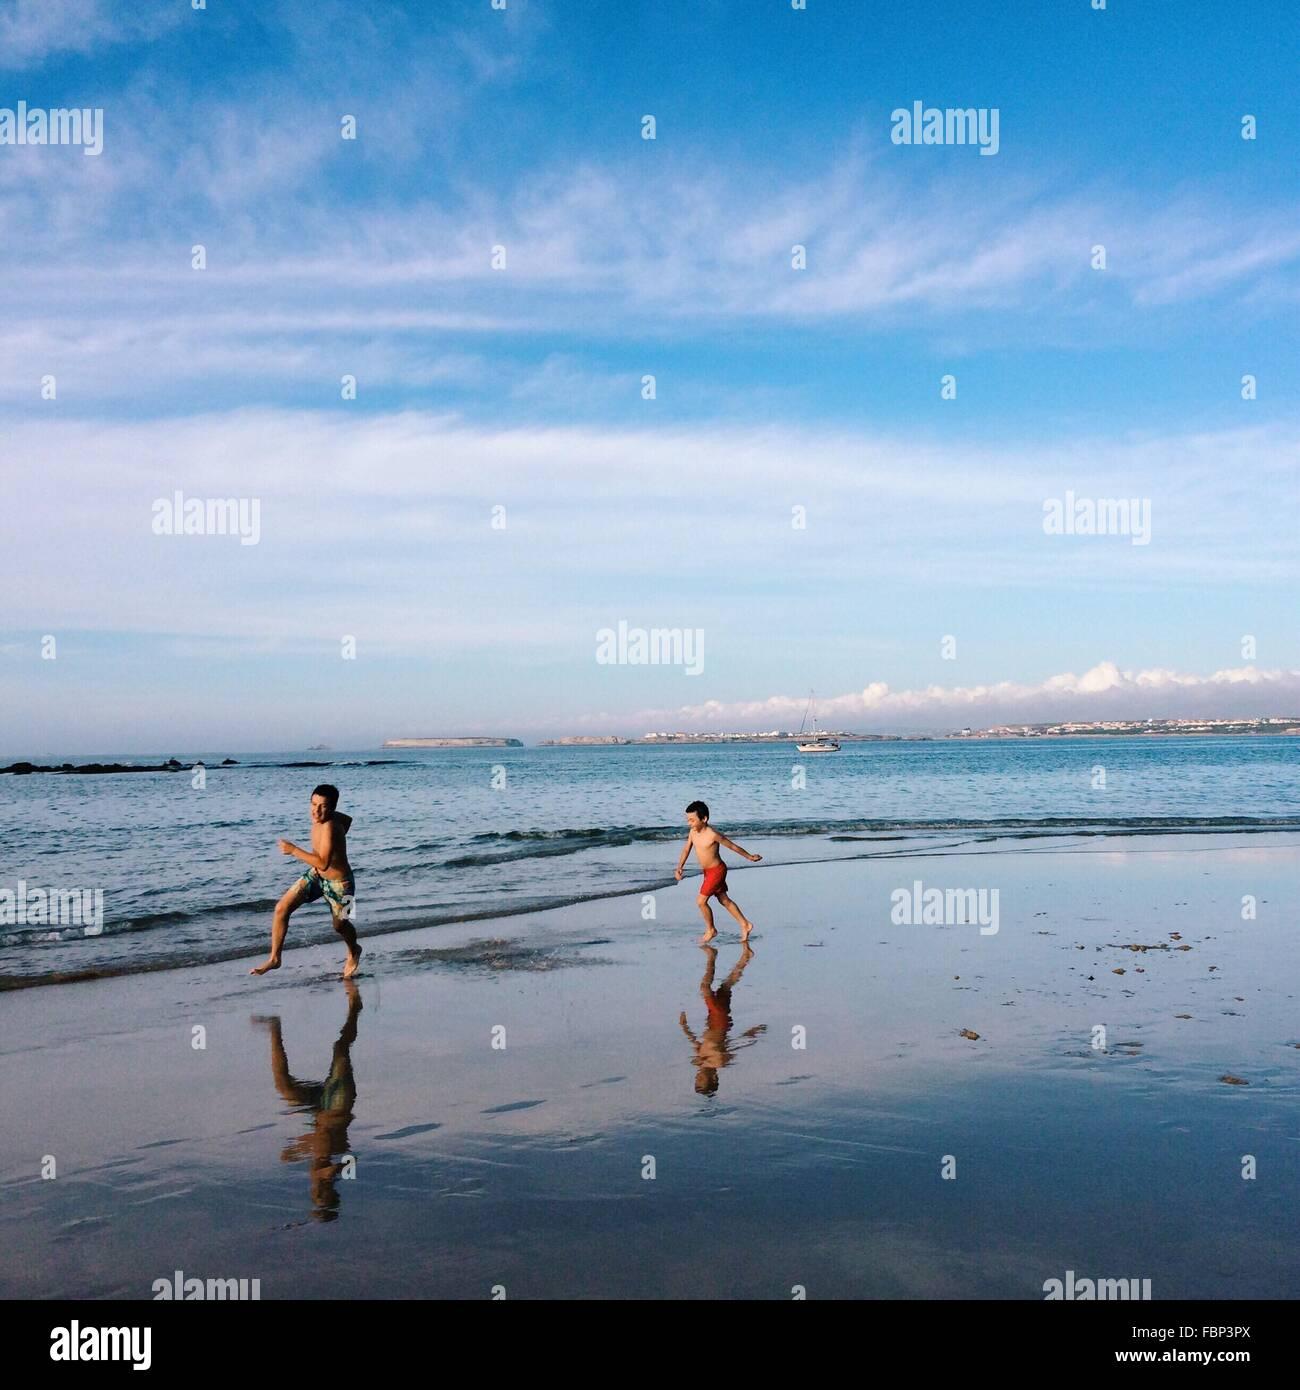 Zwei jungen laufen am Strand Stockbild